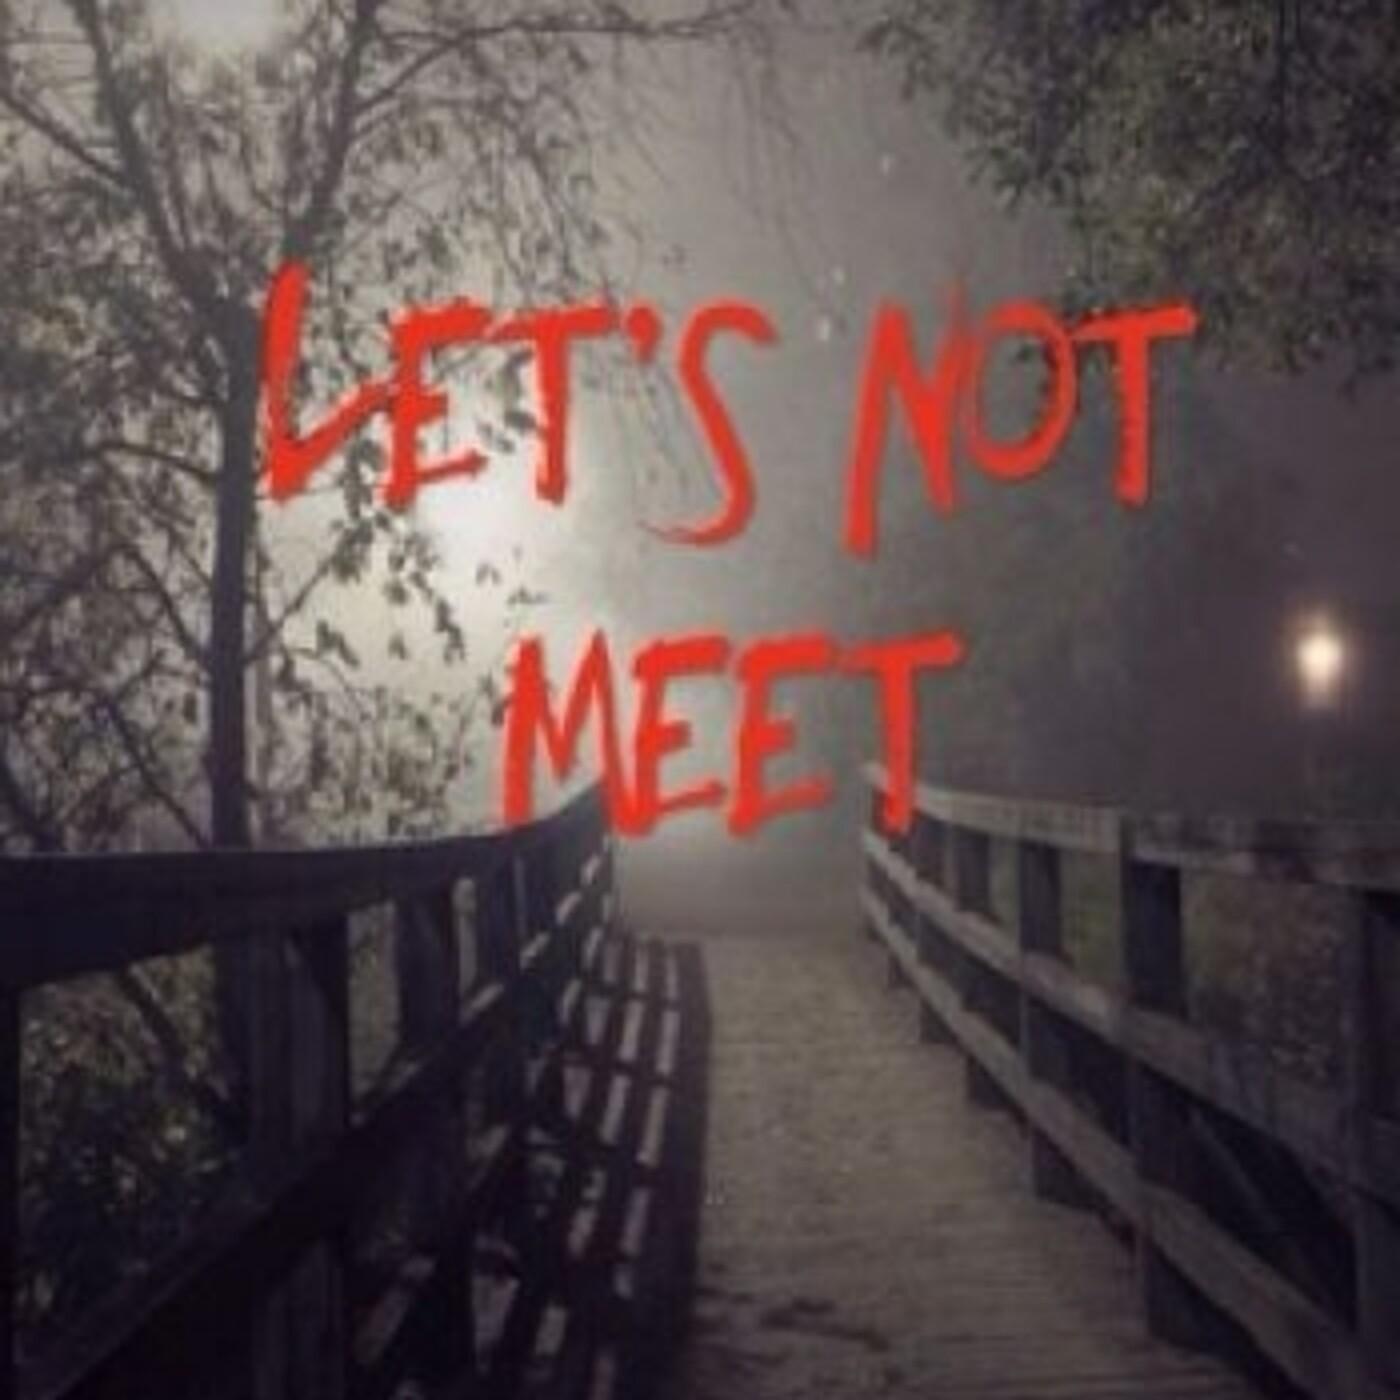 let's not meet - historias 02